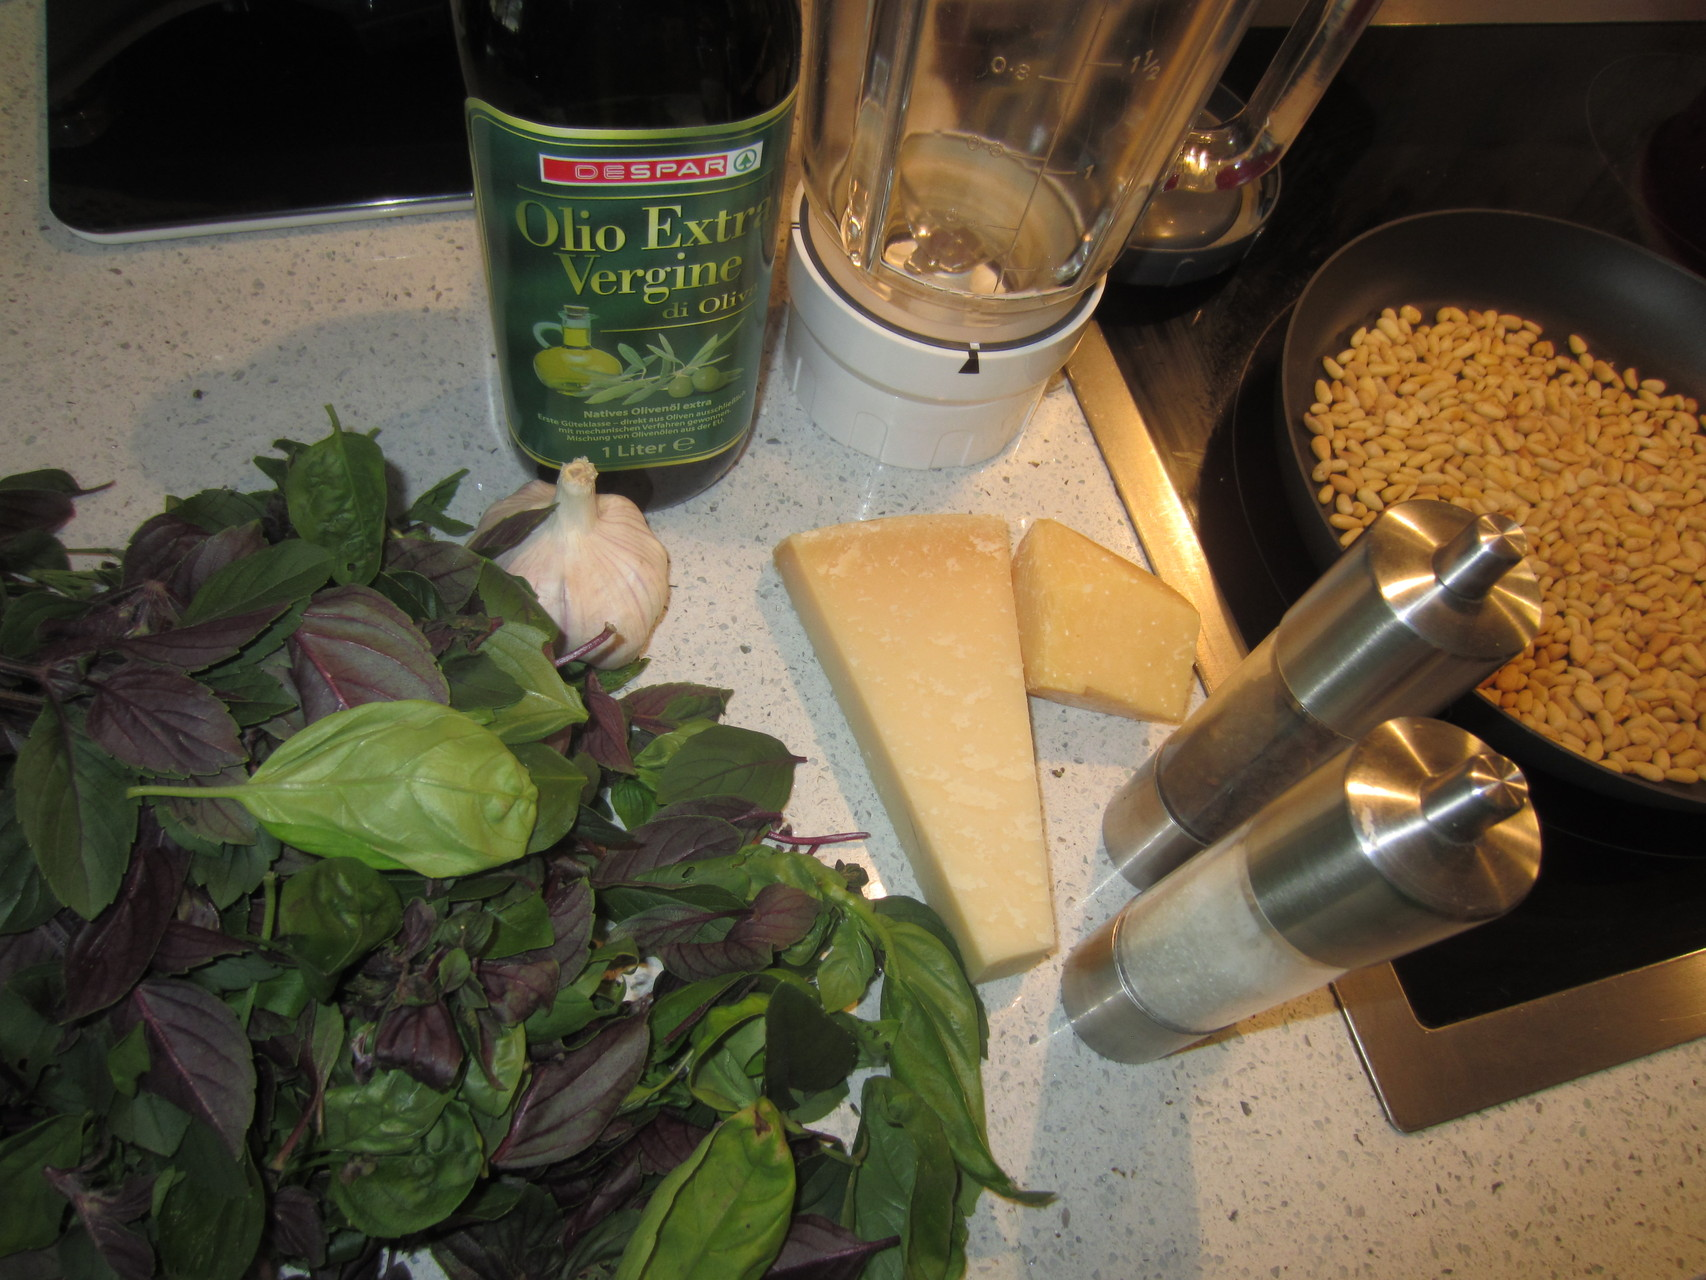 drei verschiedene basilikumarten, parmesan, kräutersalz, pfeffer, olivenöl, mixaufsatz